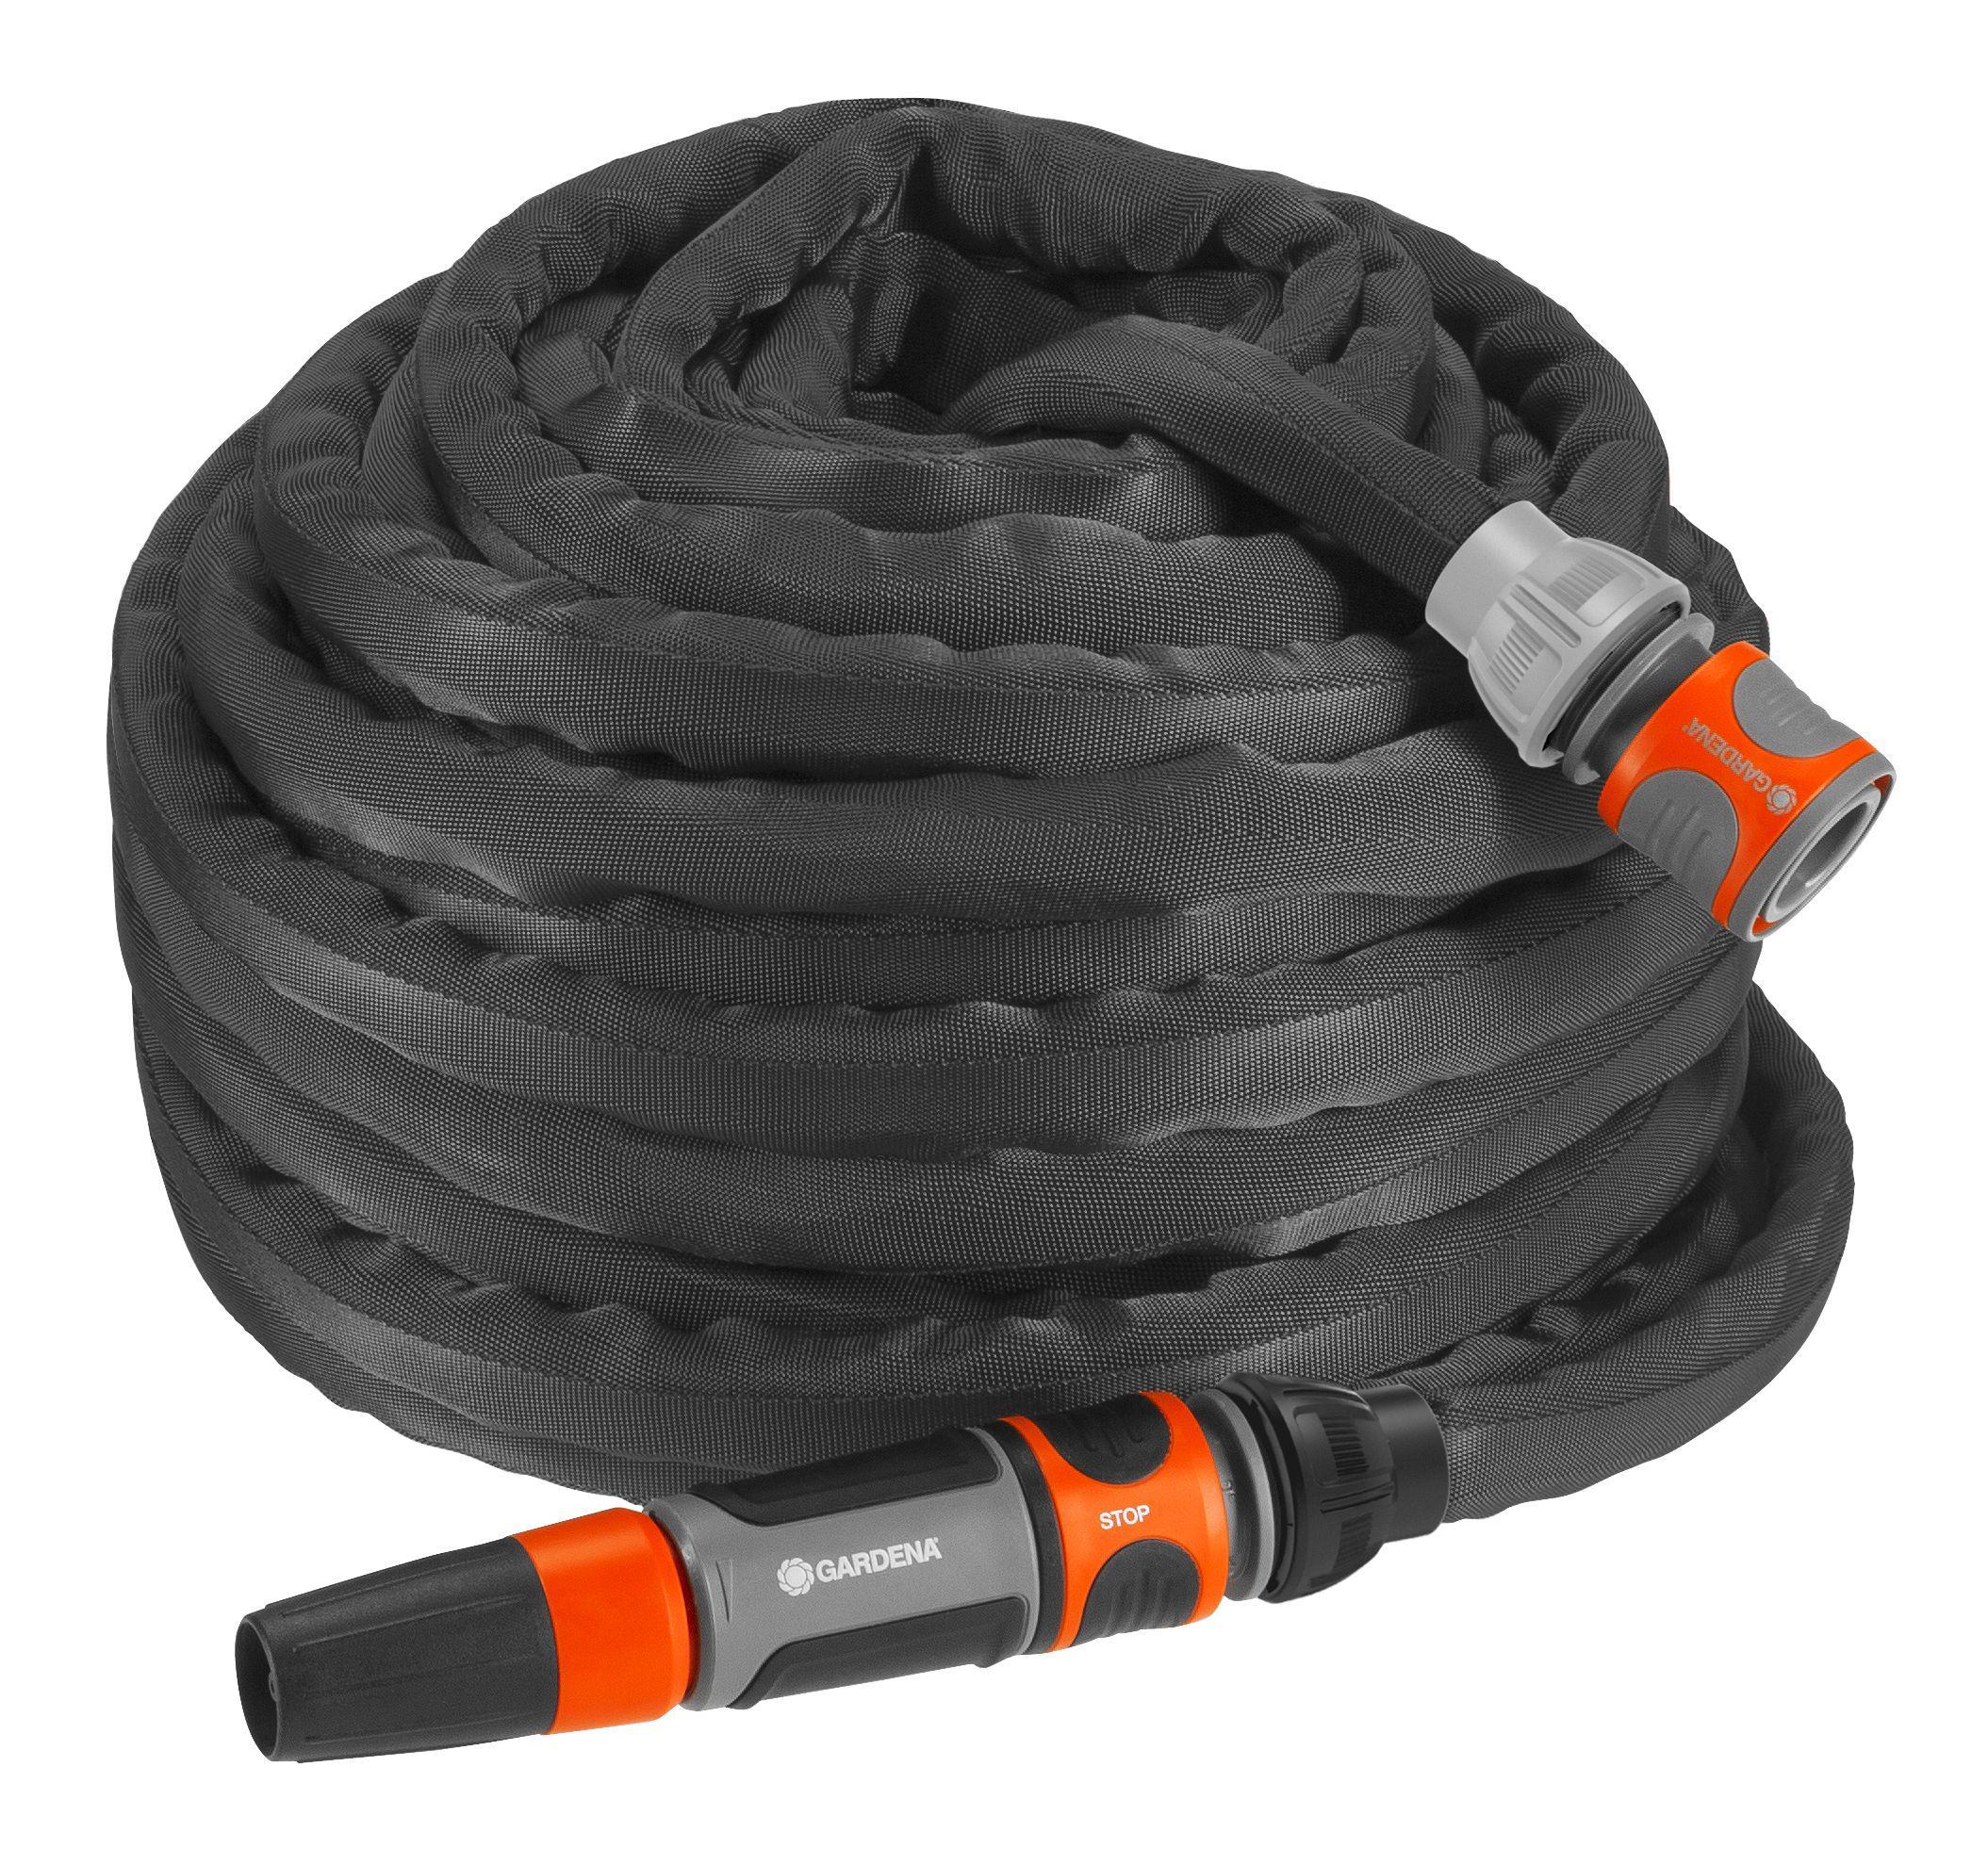 Шланг Gardena Liano 13 мм 1/2'' 20м 18435-20 set поливочный gardena 18502 20 000 00 hose 20 m tip for watering height adjustment protection from течи